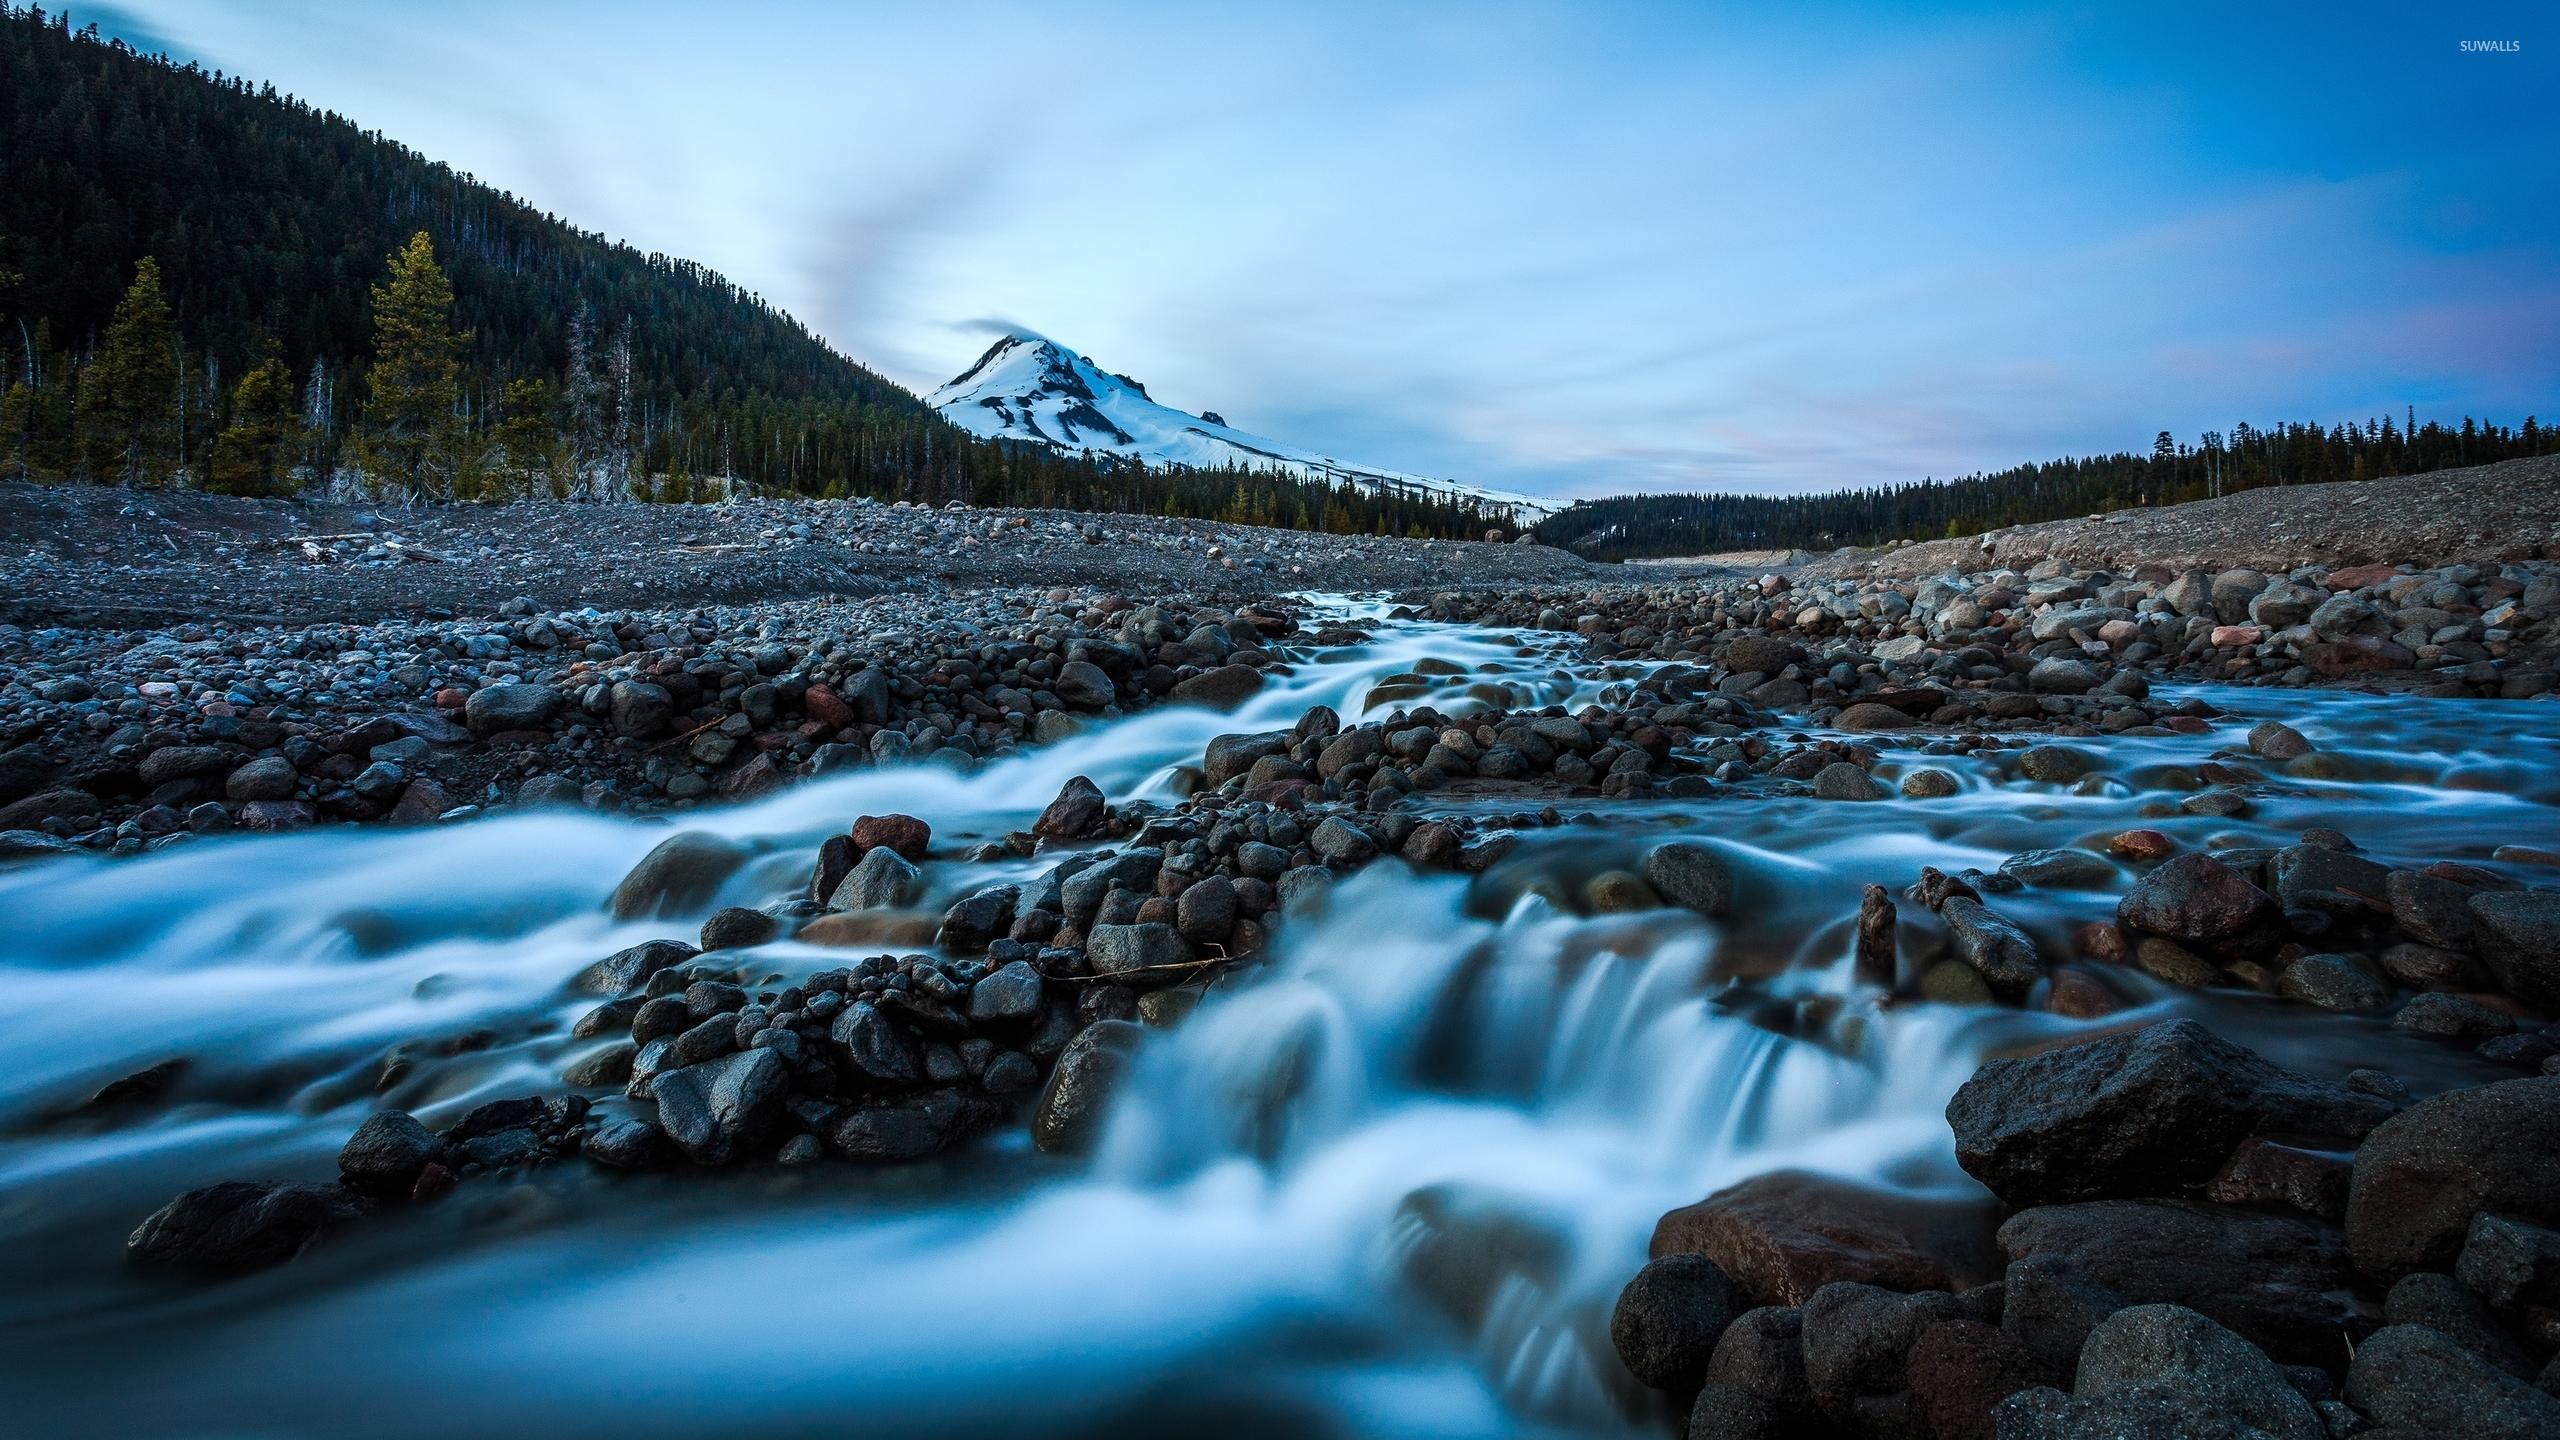 download rocky river wallpaper - photo #27